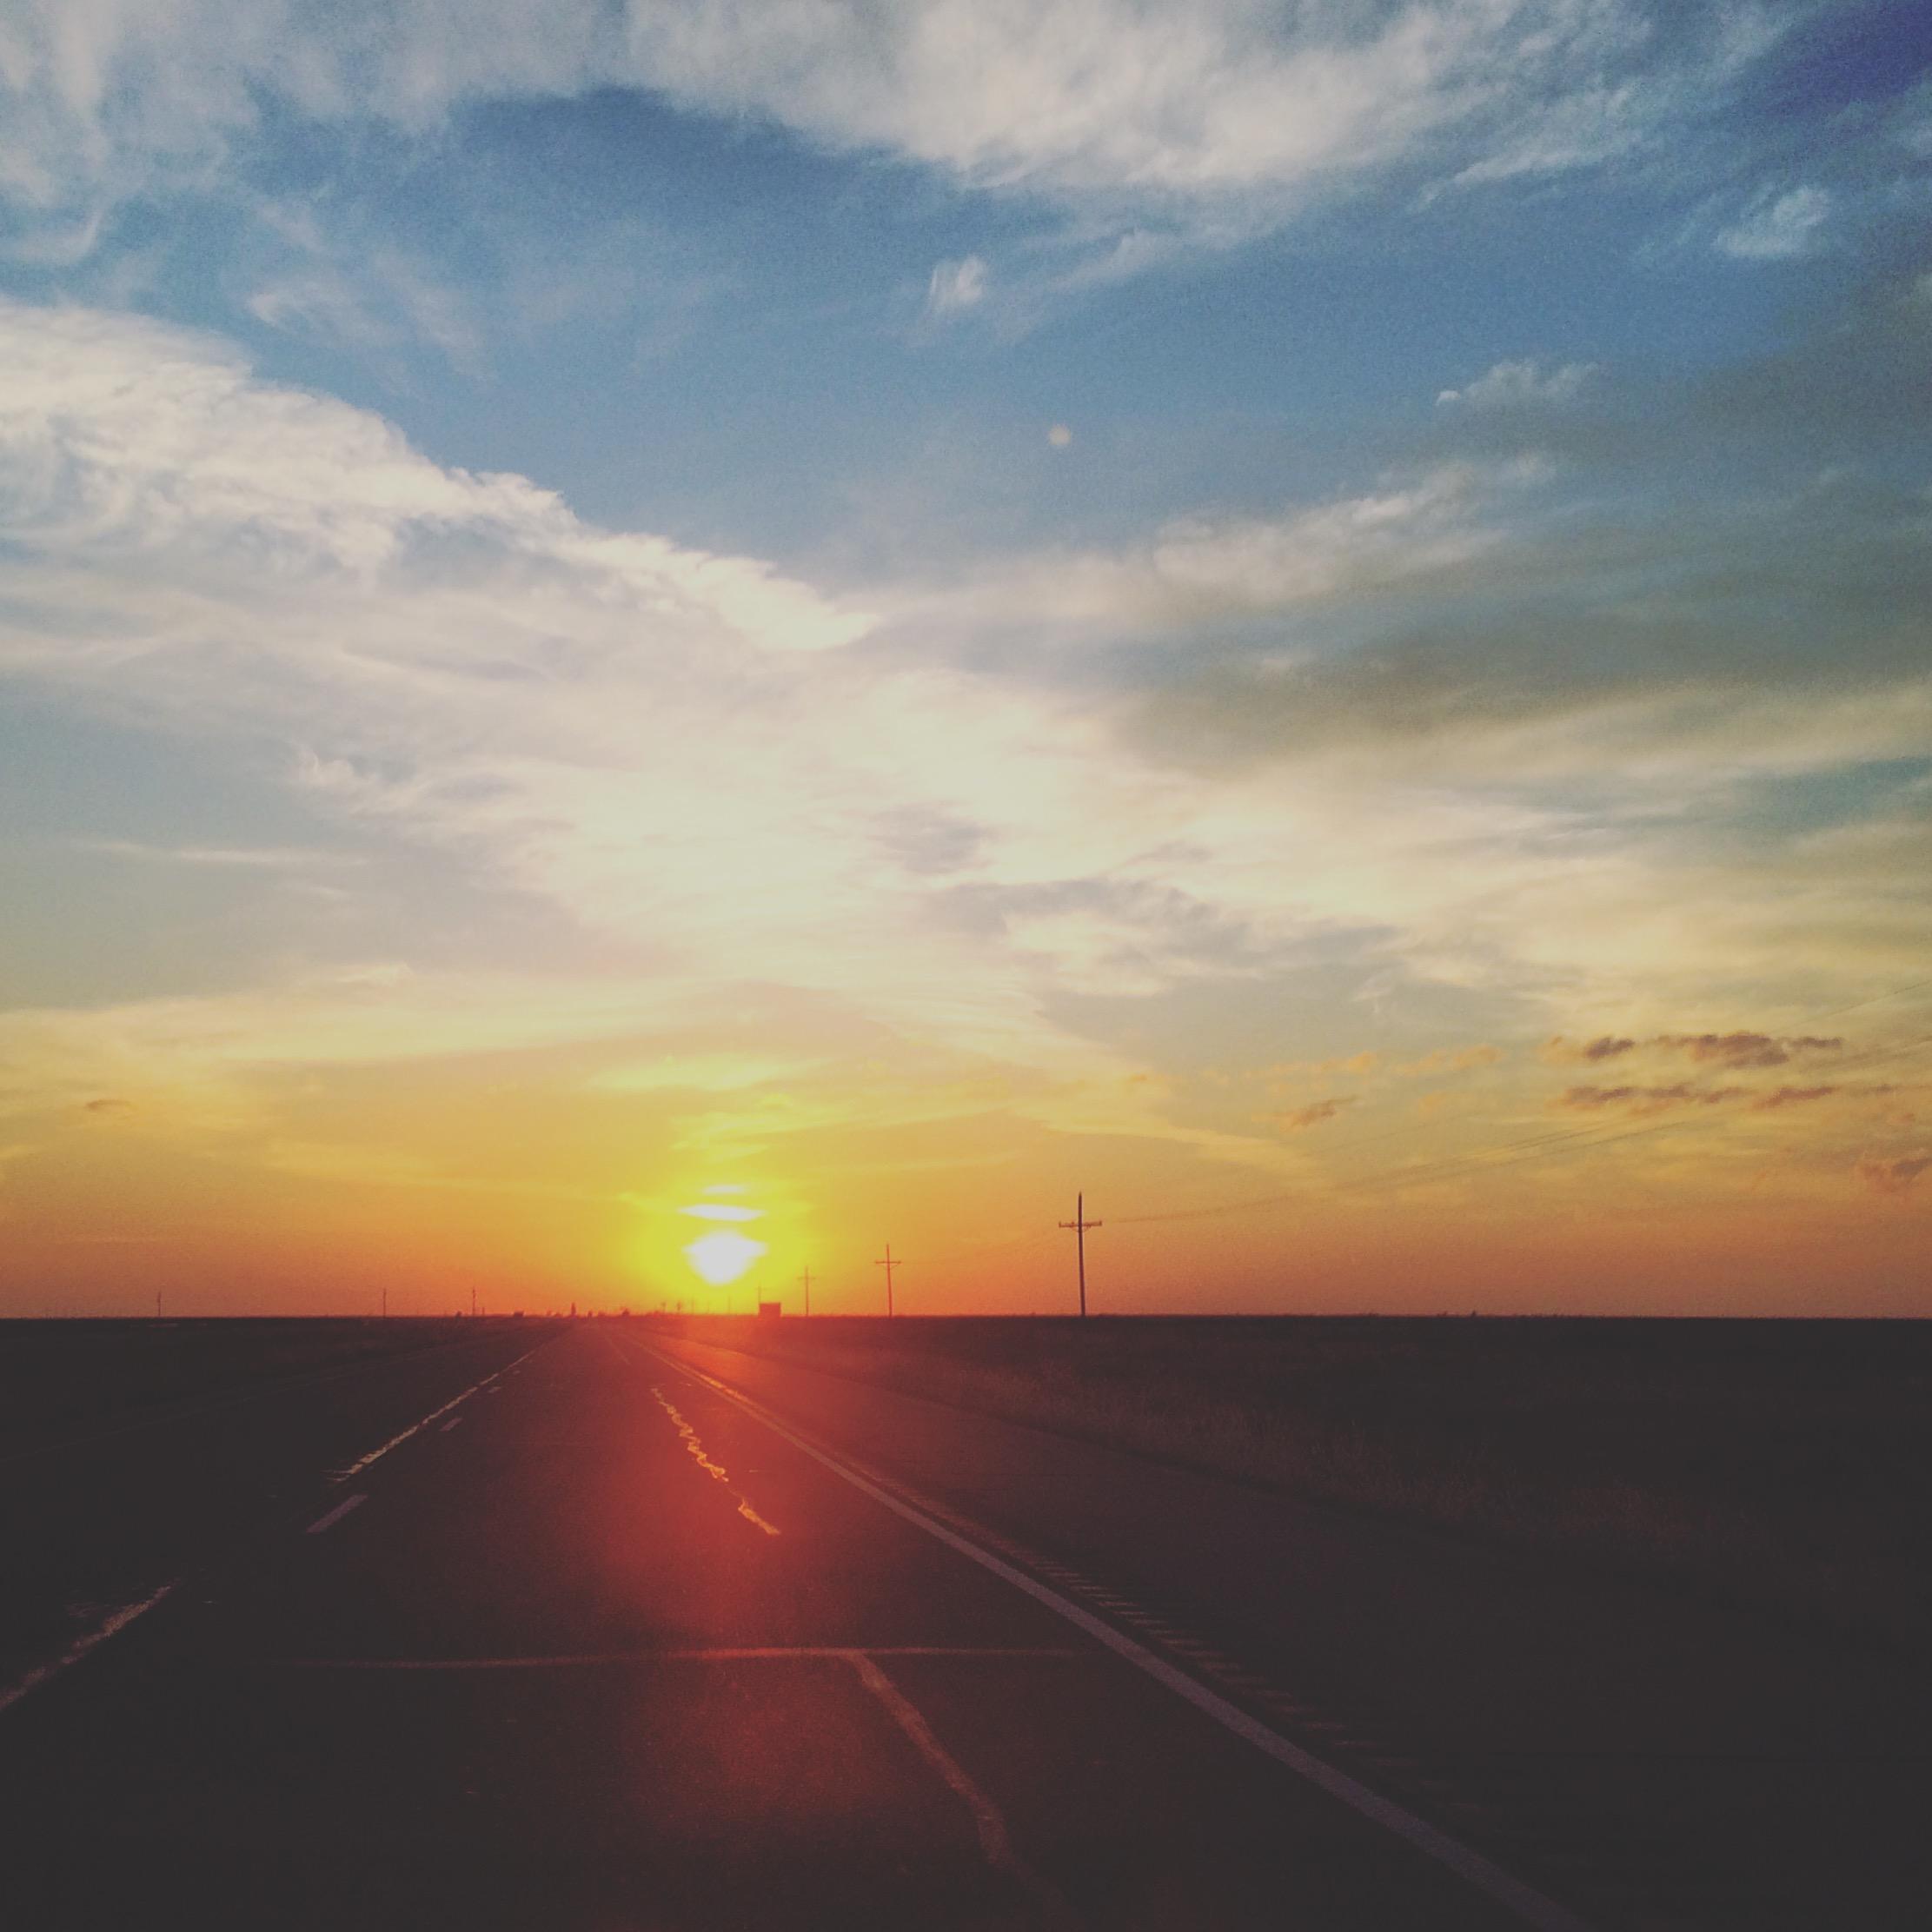 Big Texan sunrise